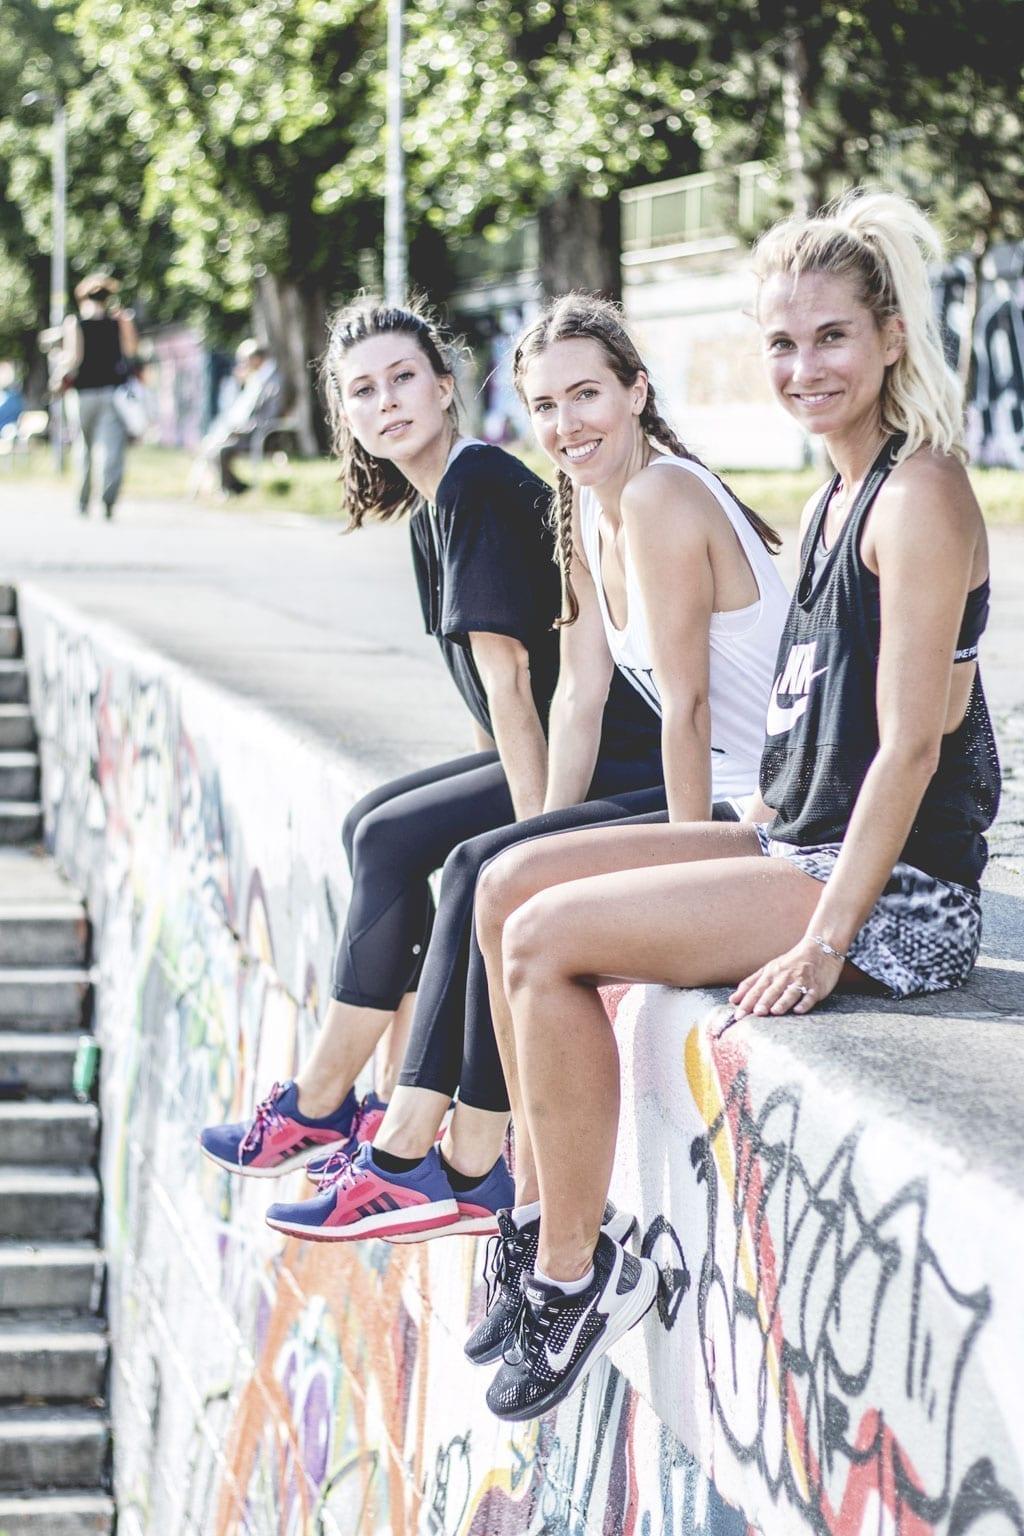 CK-1606-constantly-k-karin-kaswurm-daily-dose-fashion-lifestyle-blog-vicky-heiler-kathi-schmalzl-workout-50